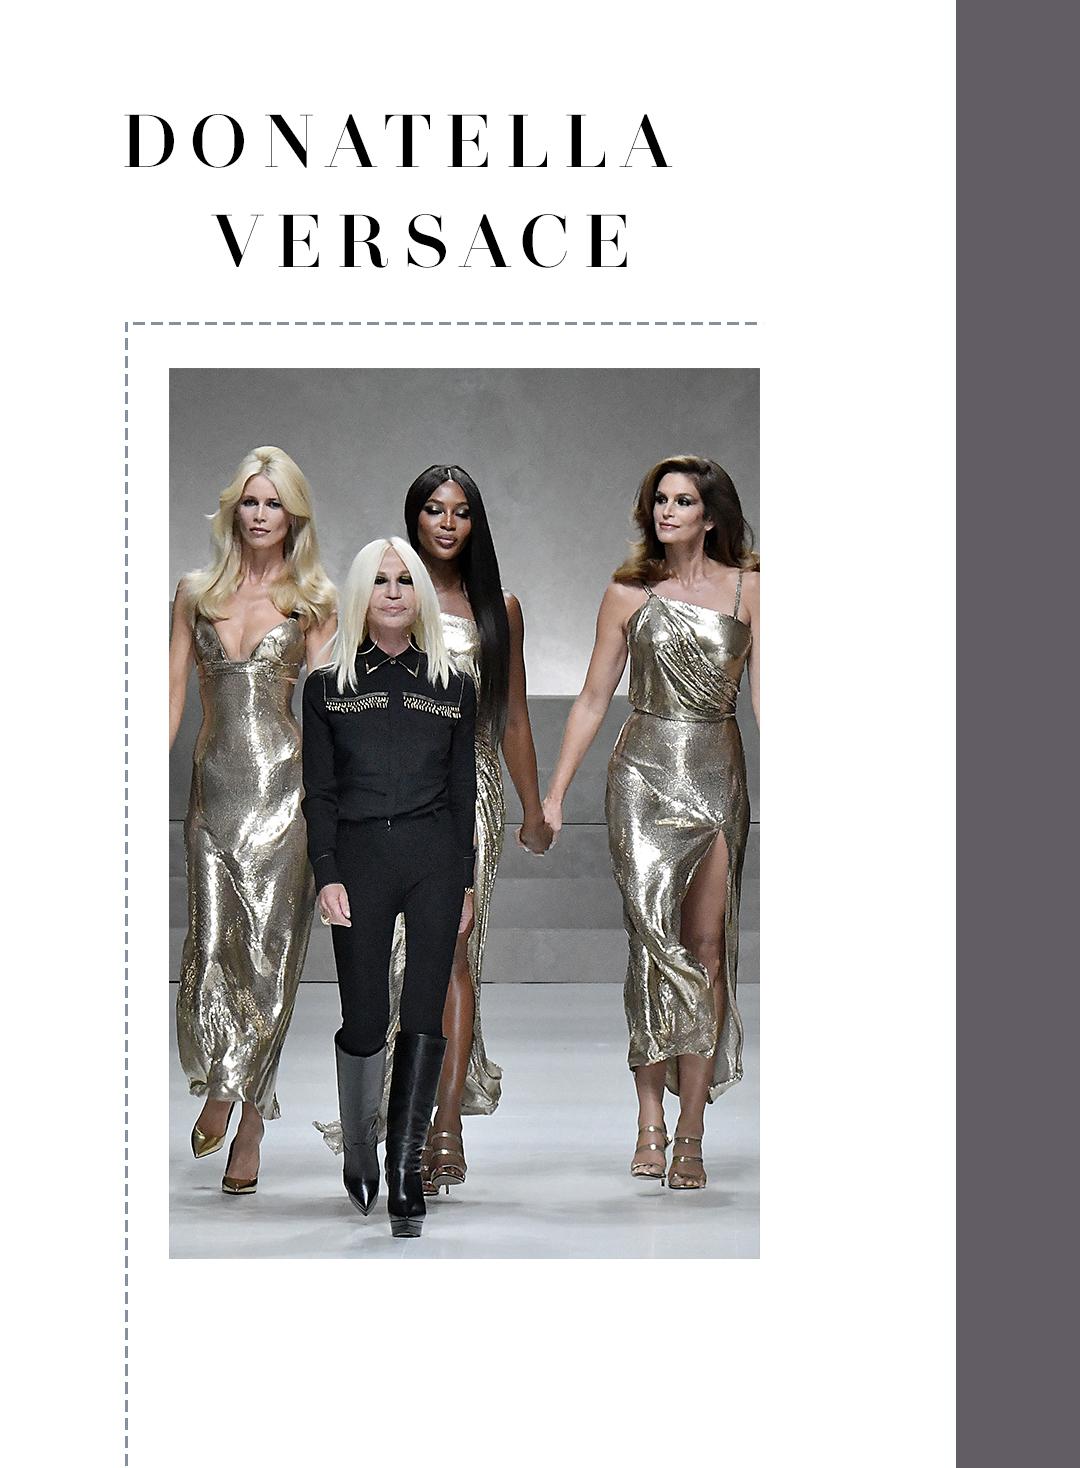 versace_post.jpg